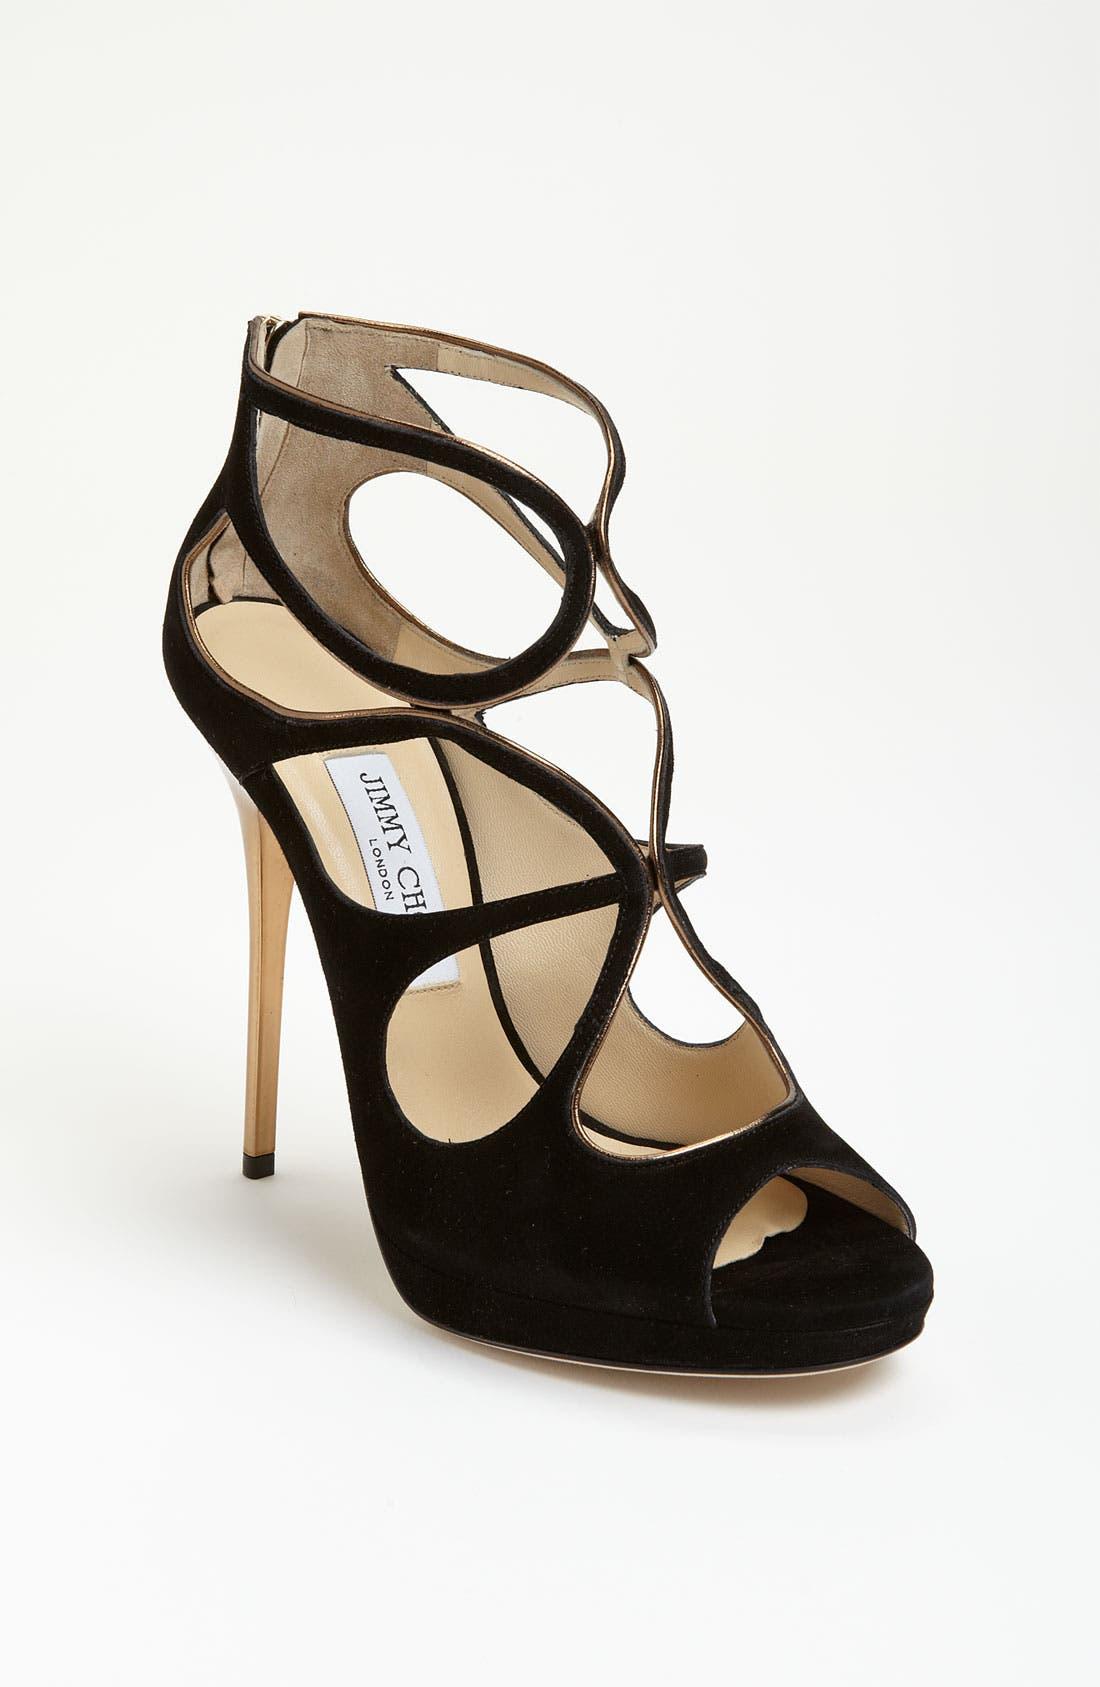 Alternate Image 1 Selected - Jimmy Choo 'Loila' Sandal